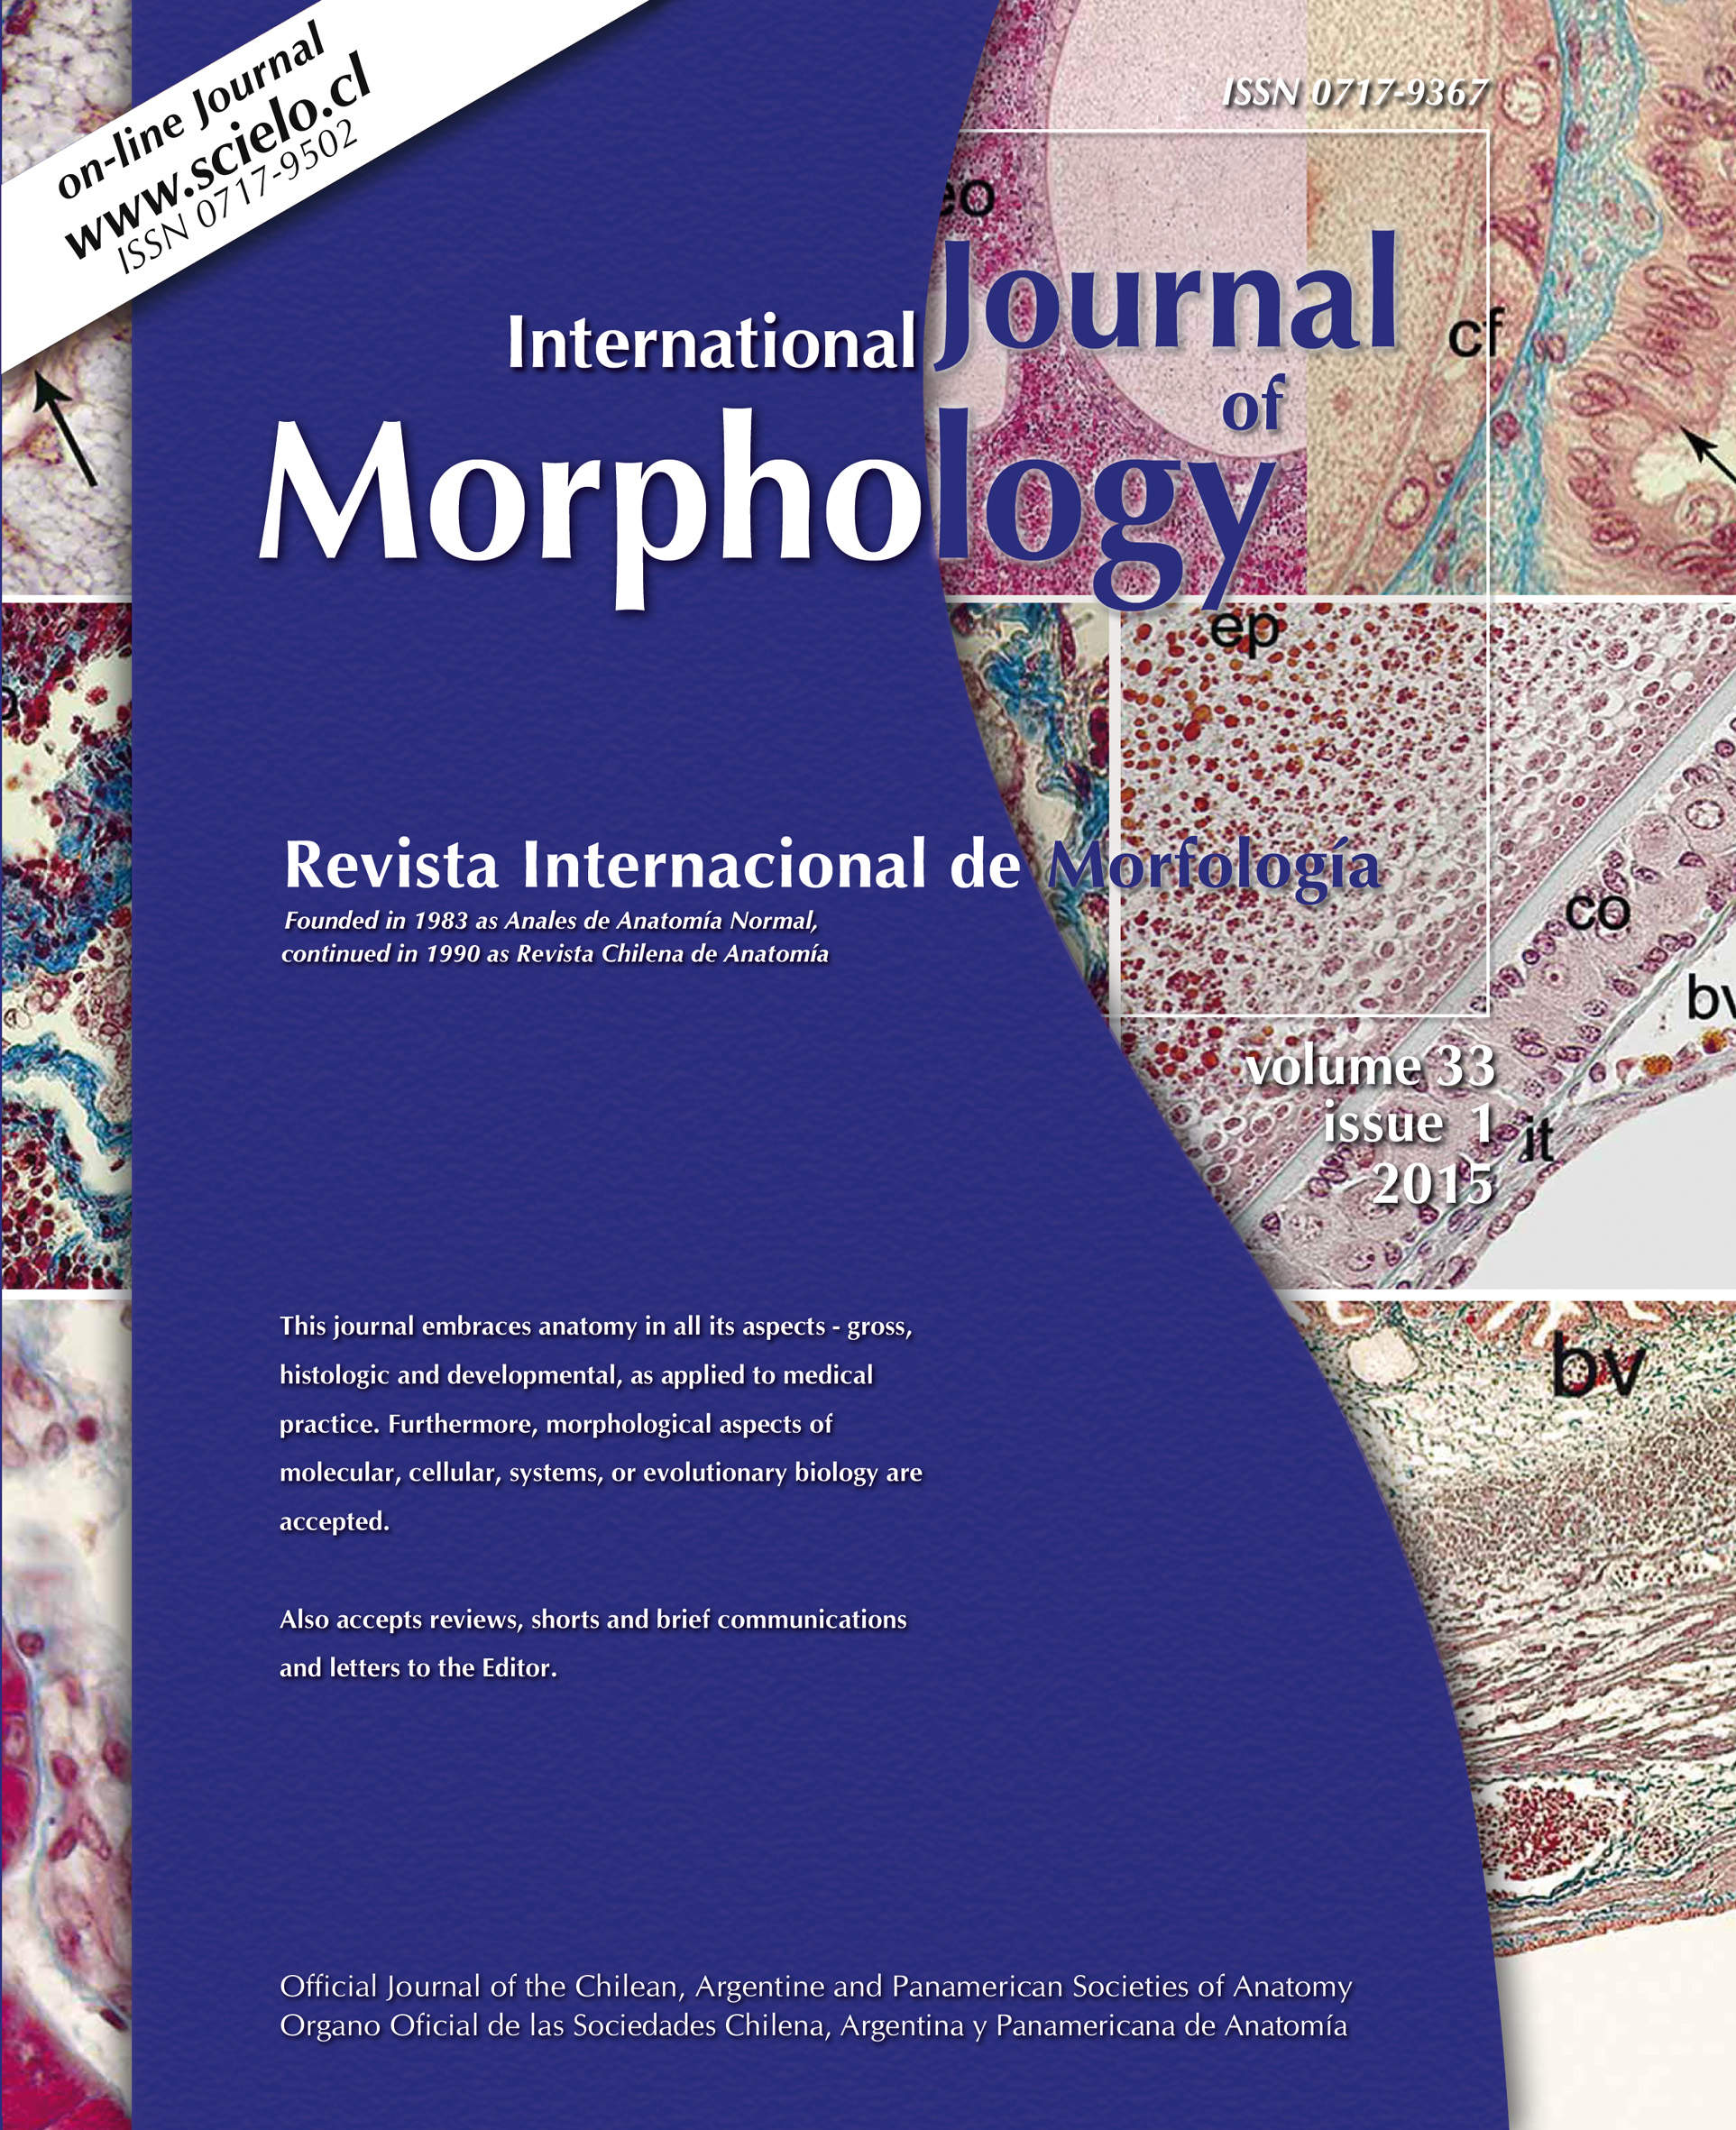 Fascículo 1 Archive - International Journal of Morphology